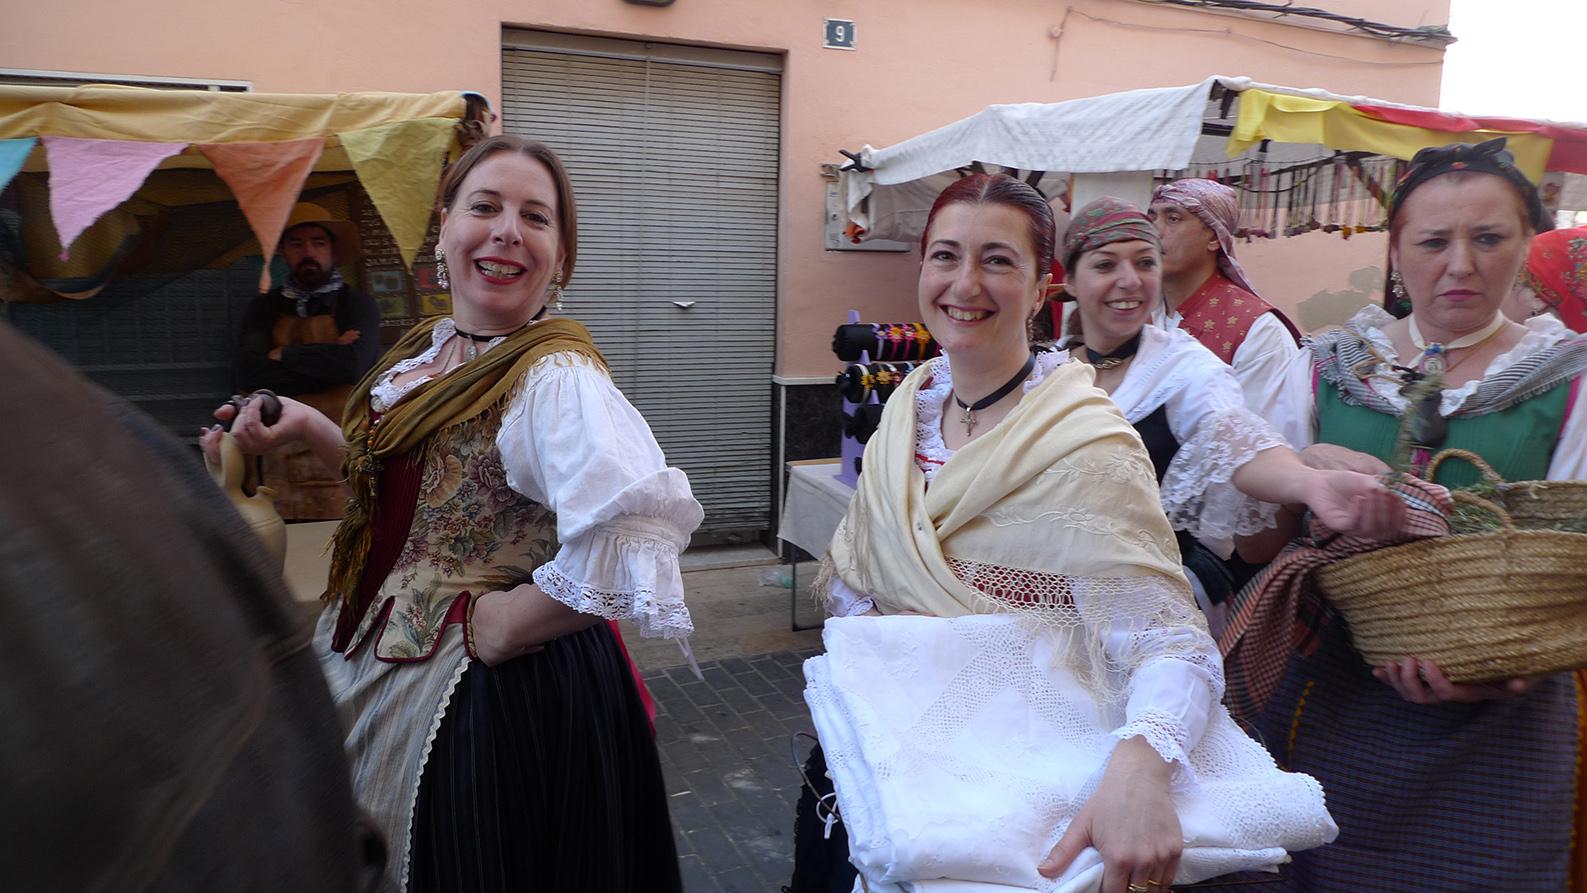 2014-02-23 - Baladre a Fira St. Marcia-ROTOVA (66)